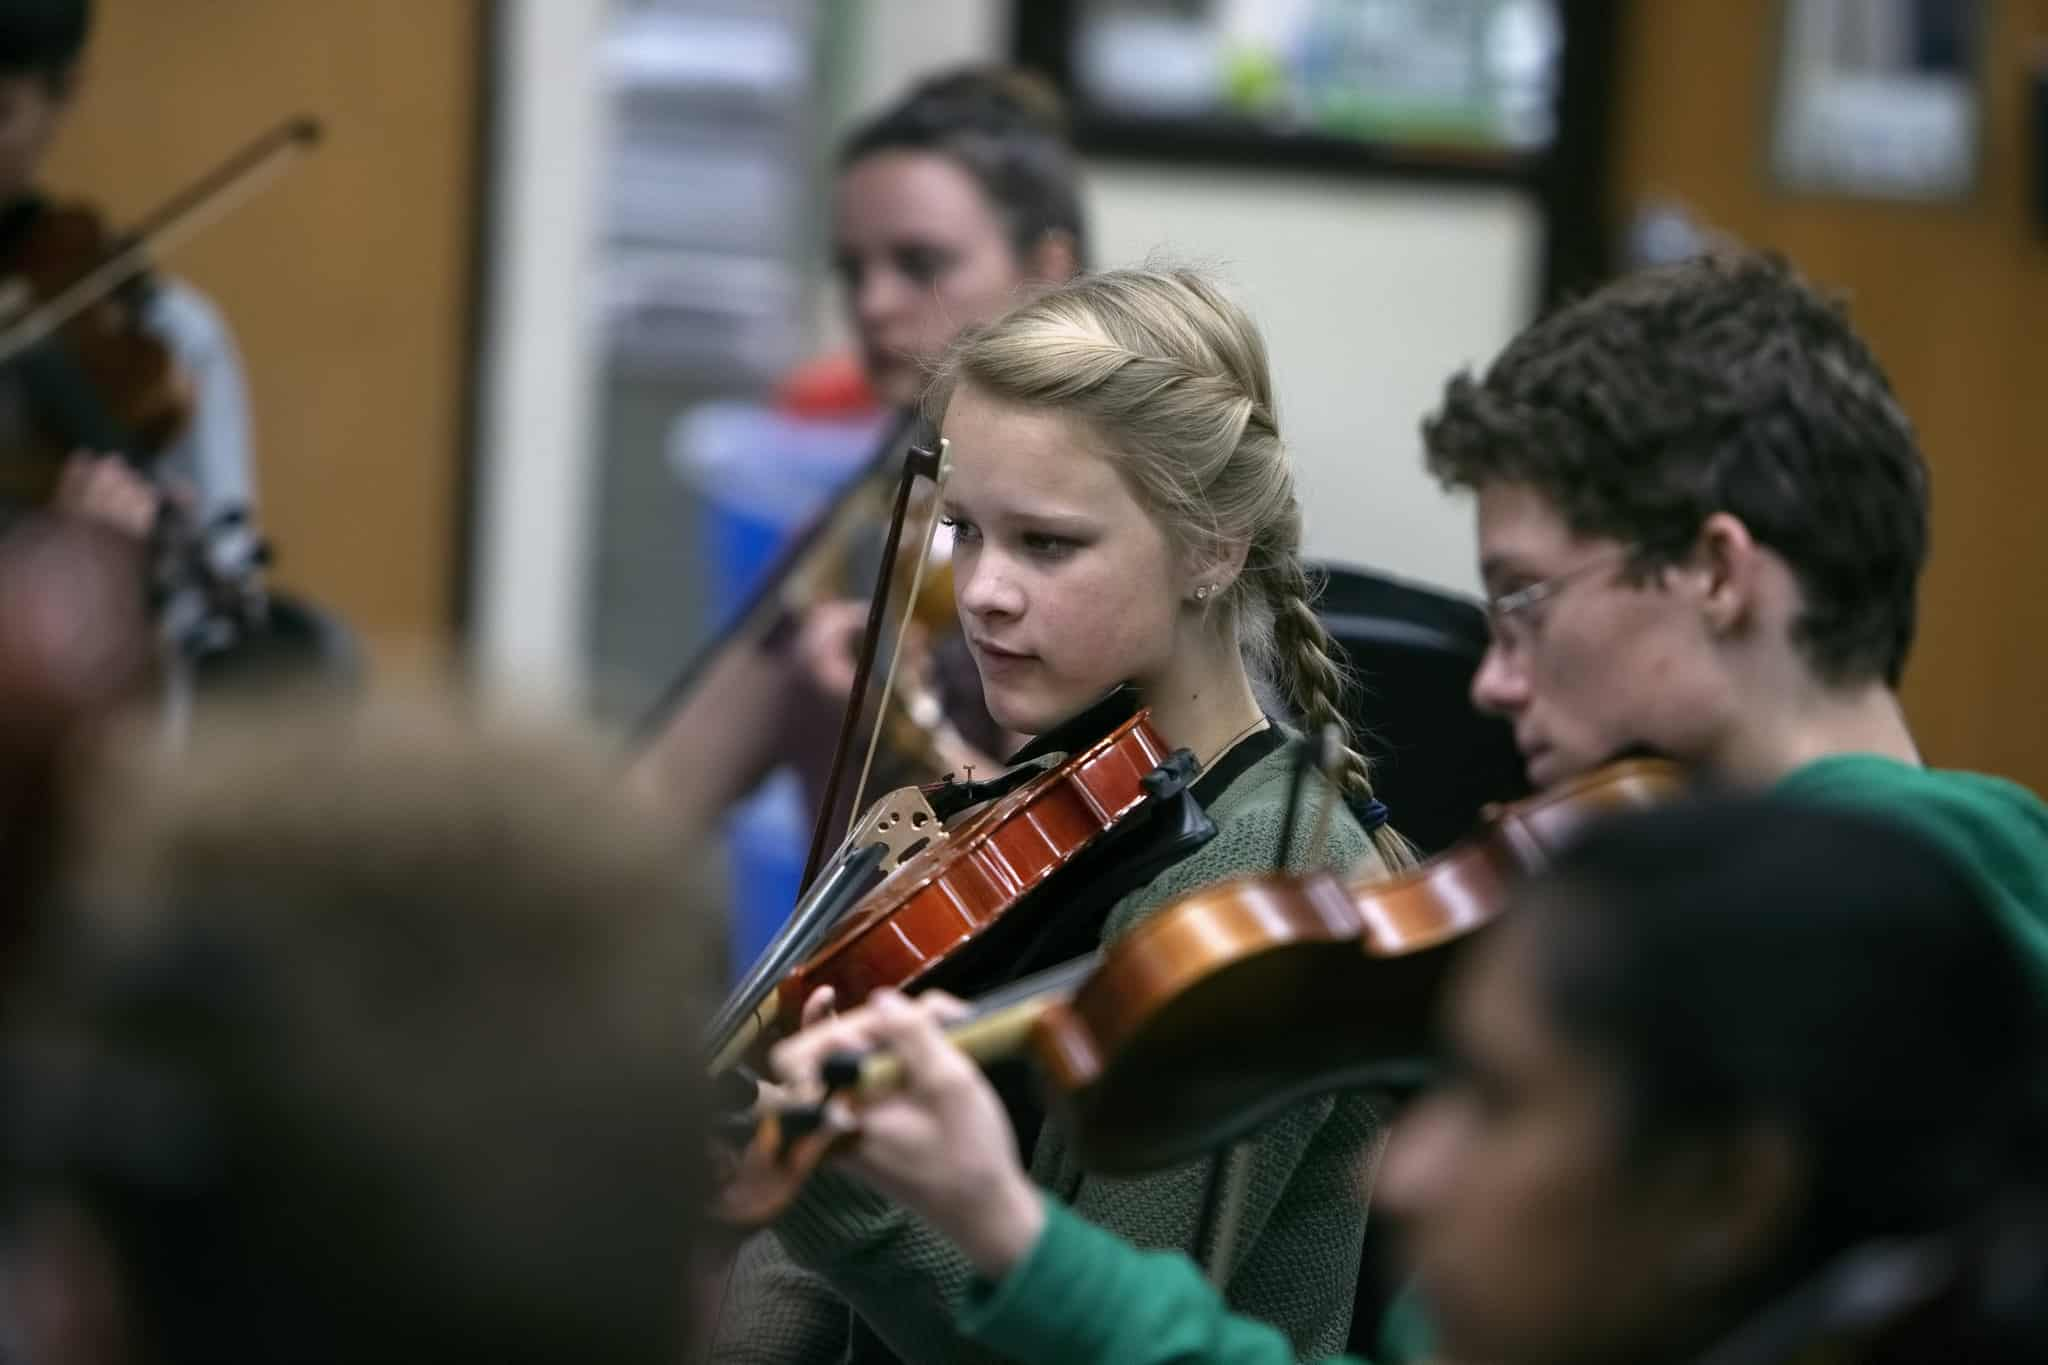 students playing violins